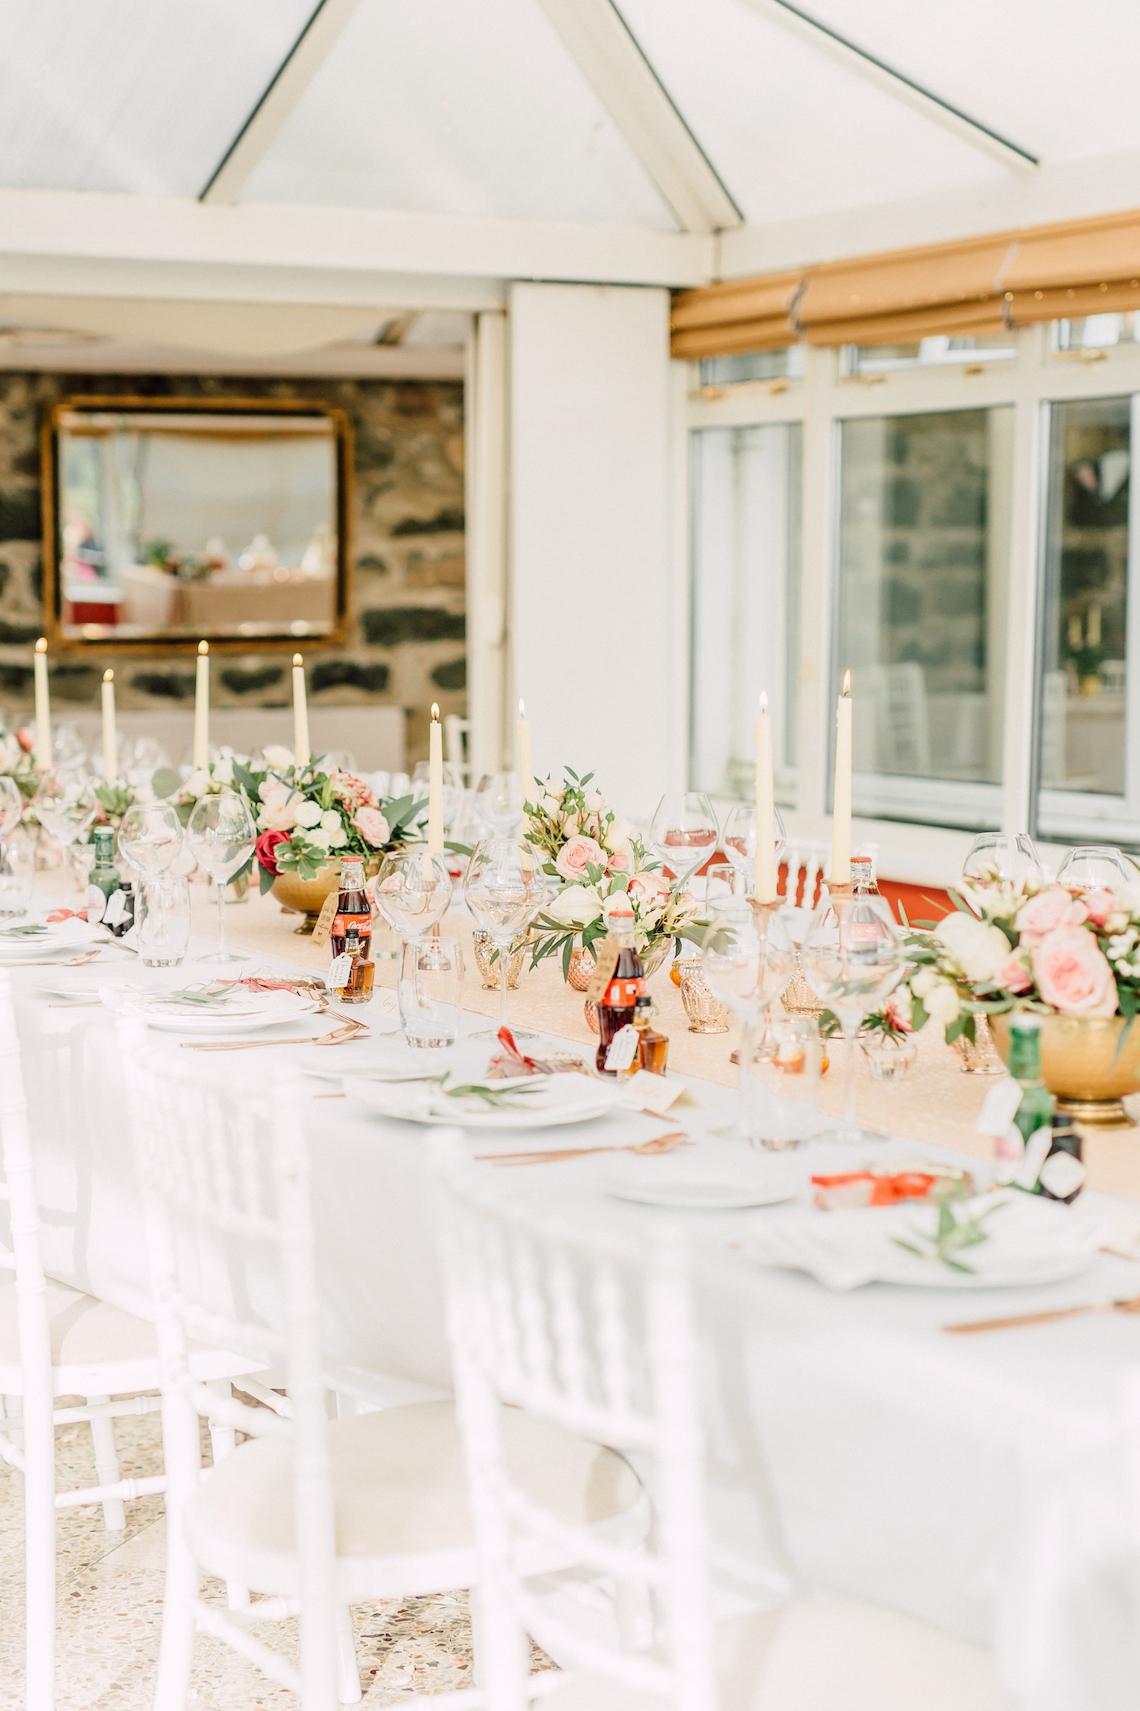 Intimate & Idyllic Wales Country House Wedding | Heledd Roberts Photography 39